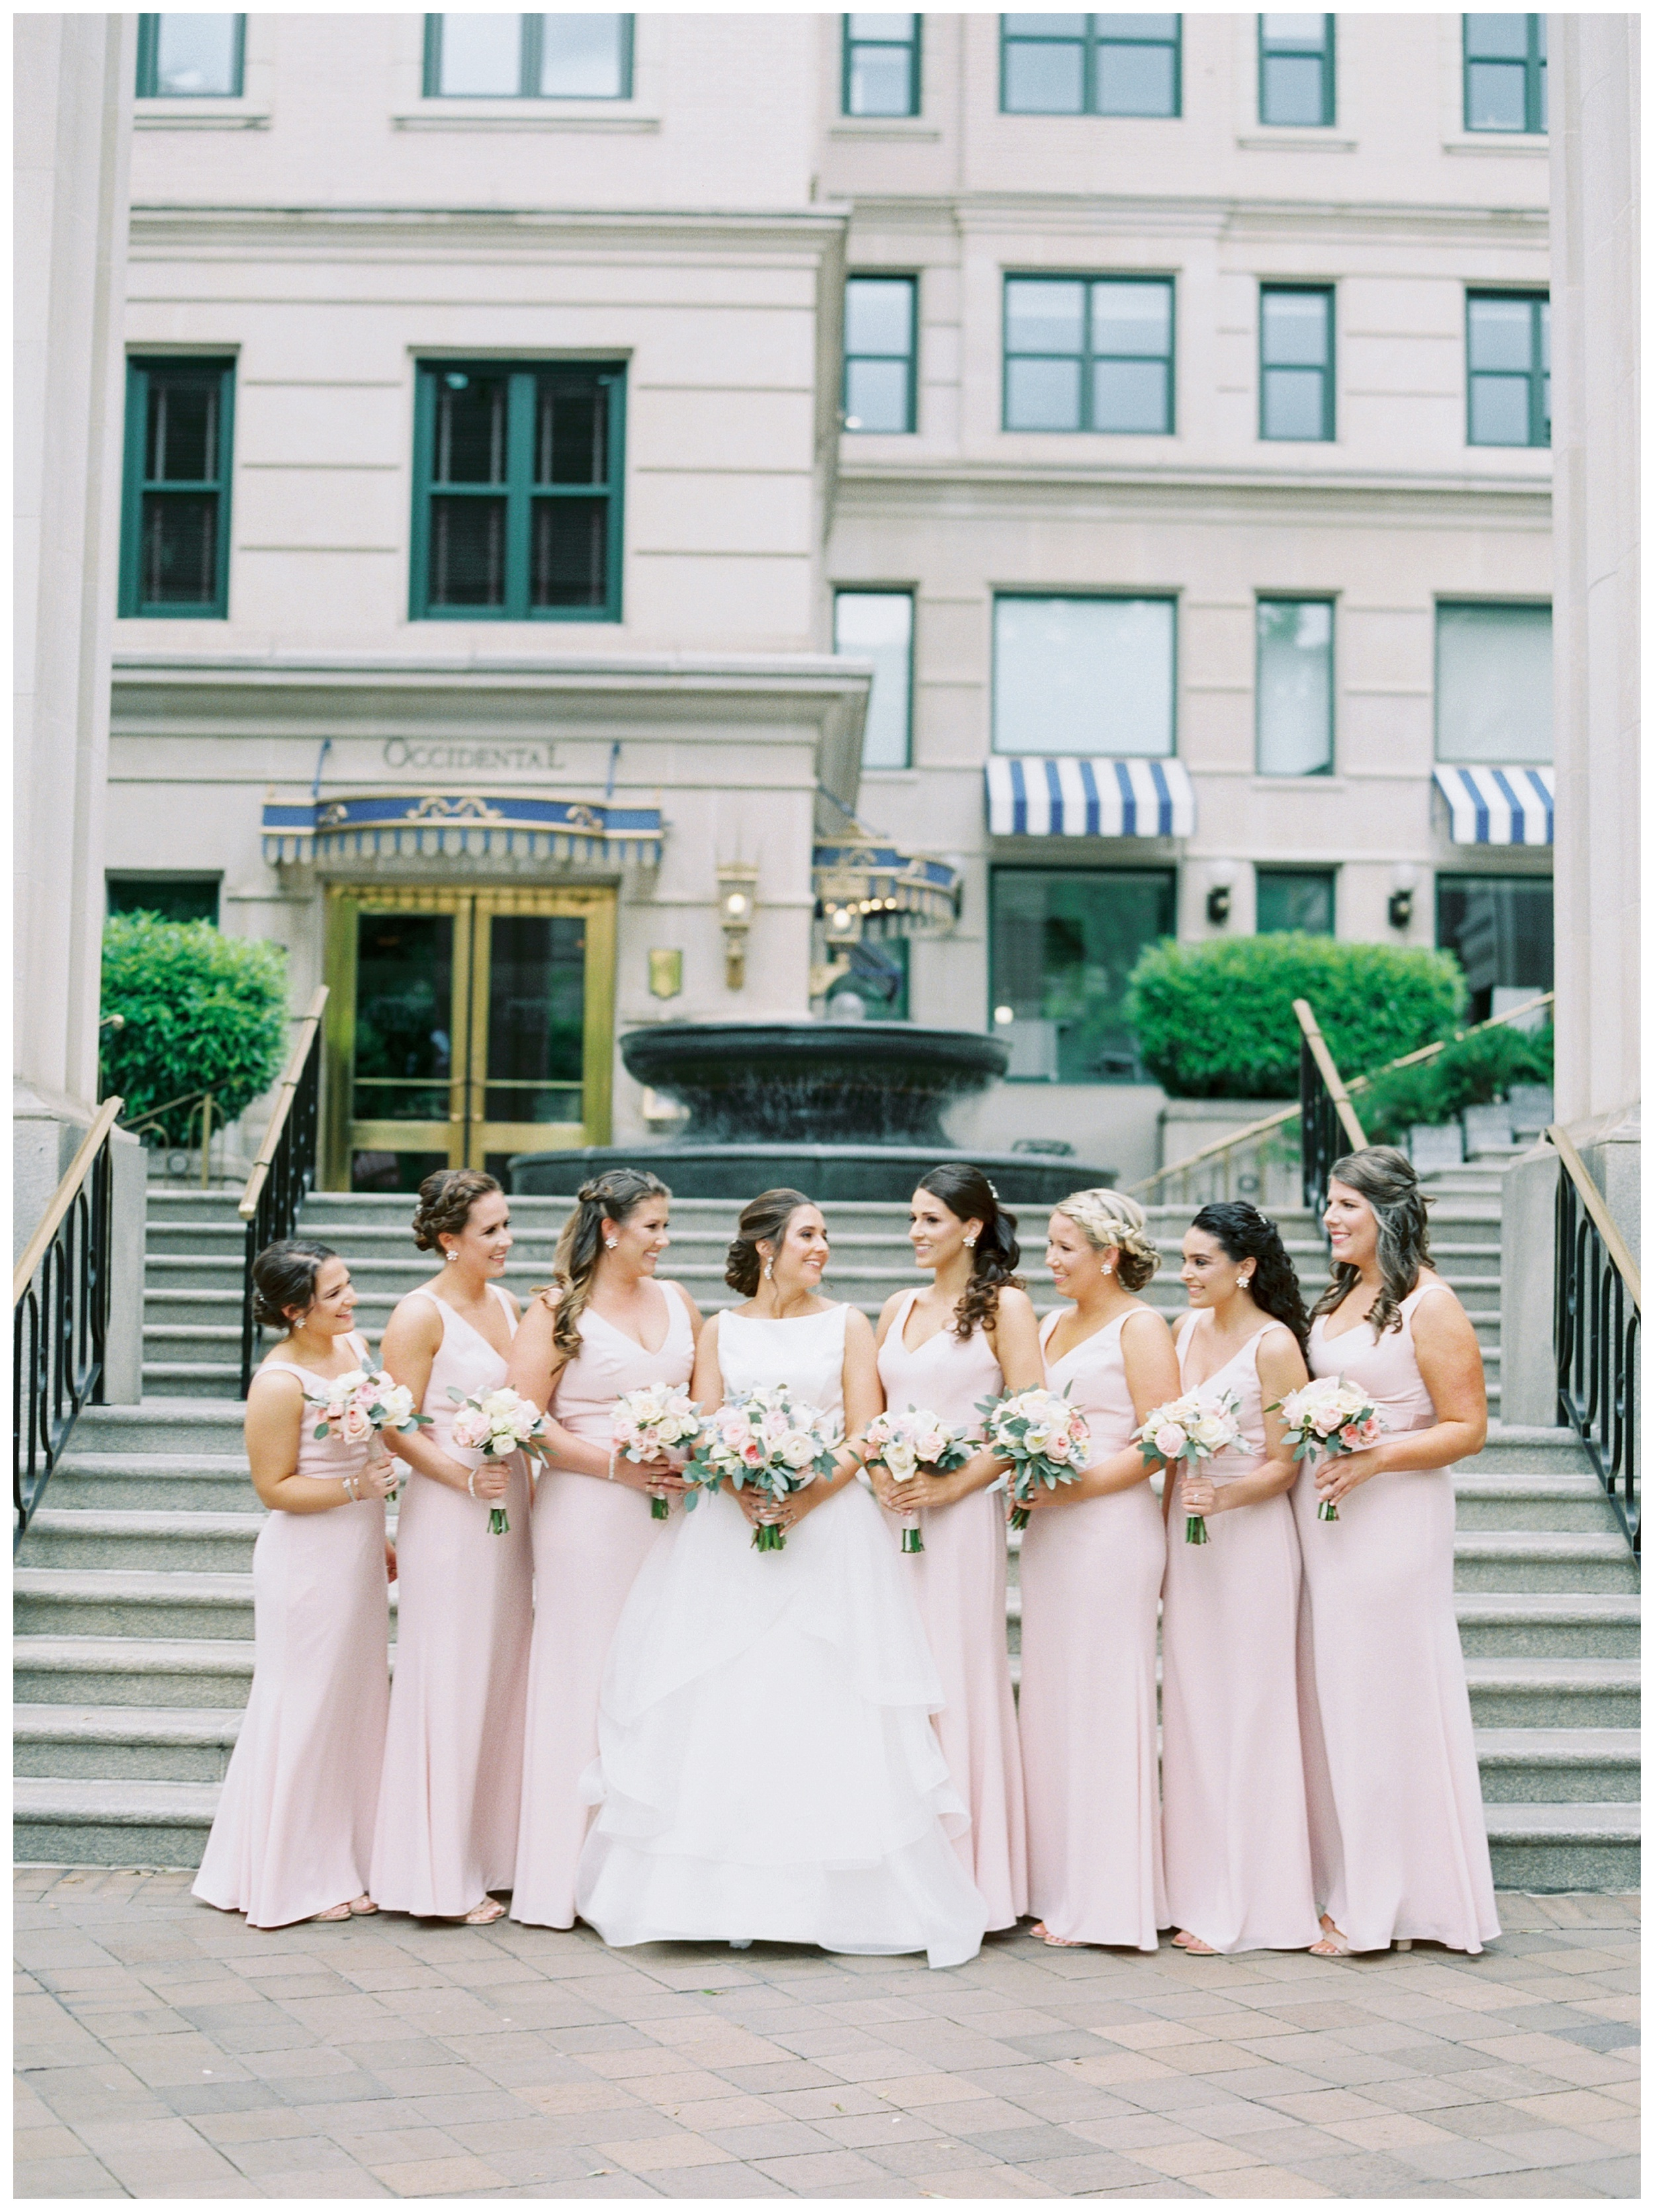 DAR Constitution Hall Wedding Wedding | Daughters of the American Revolution Wedding | District of Columbia Film Wedding Photographer Kir Tuben_0027.jpg